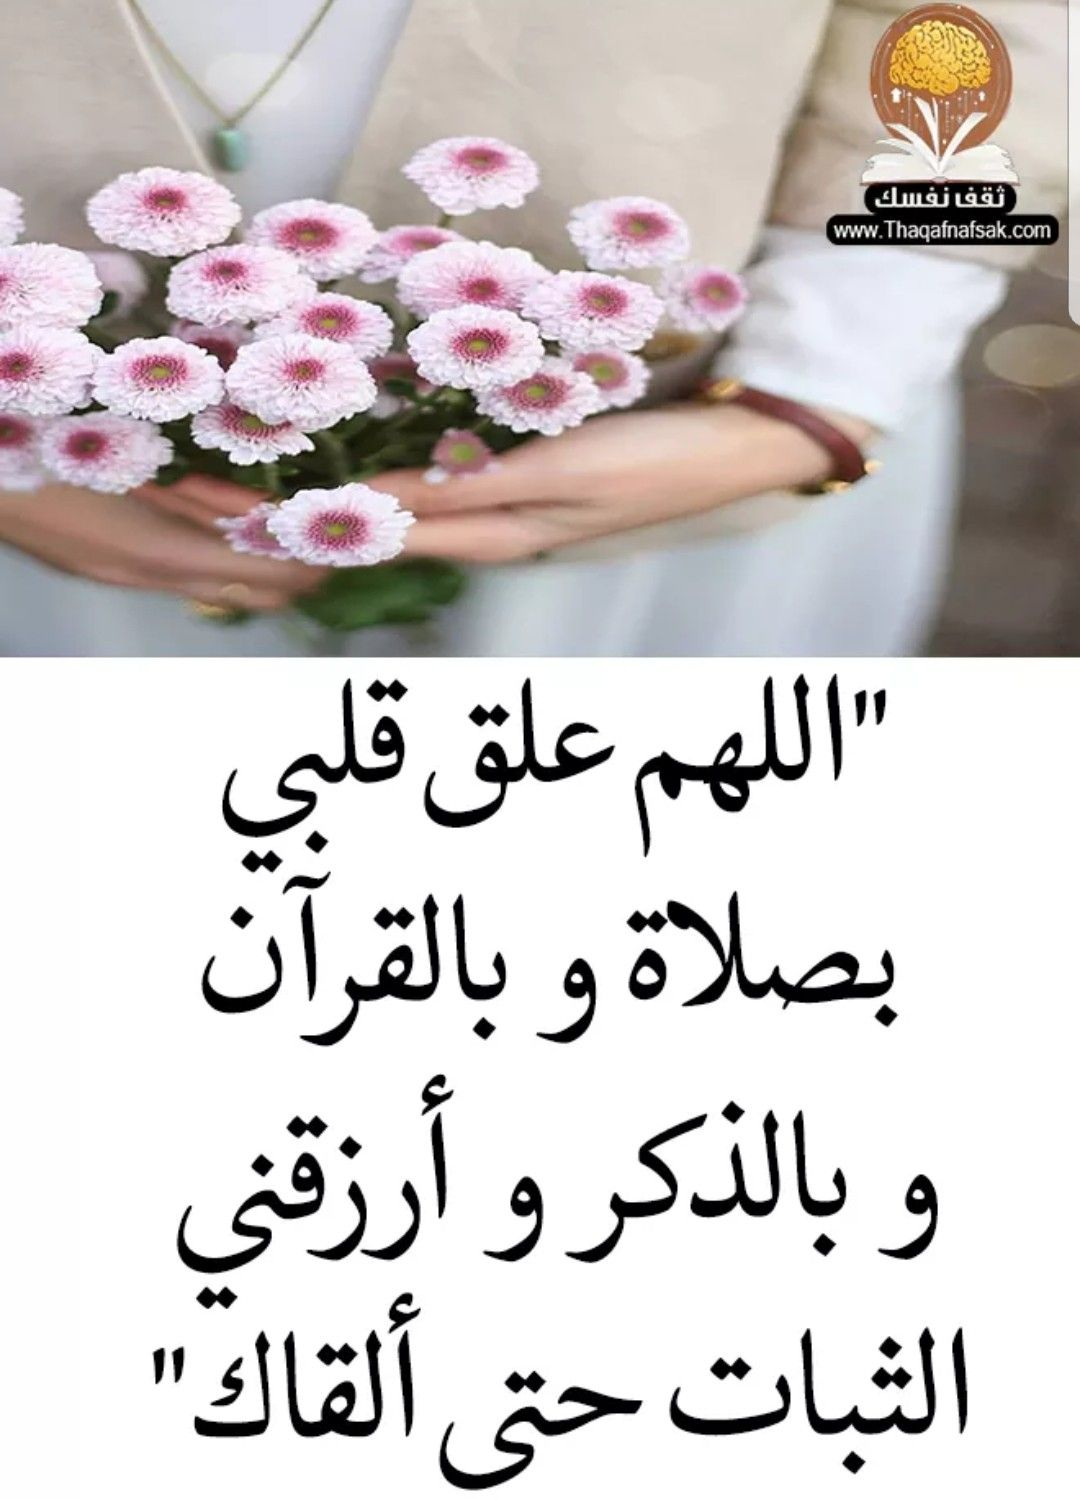 اللهم امين Islam Facts Positive Notes Sweet Words